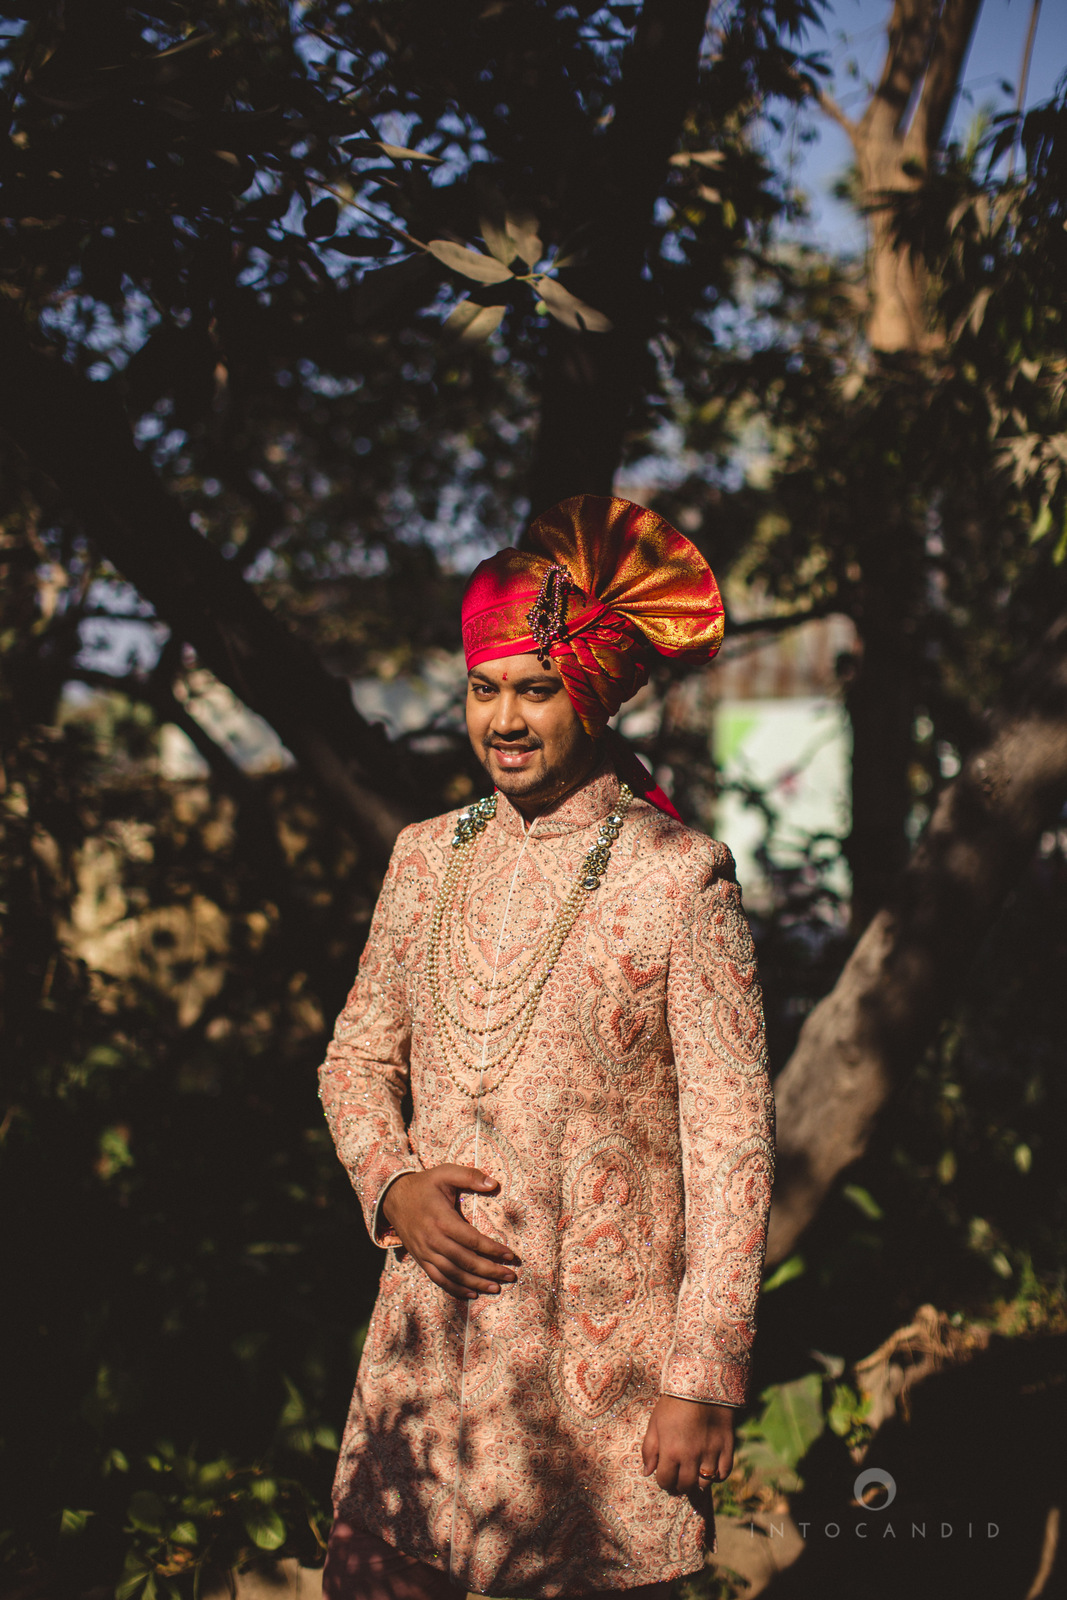 mumbai-gujarati-wedding-photographer-intocandid-photography-tg-025.jpg